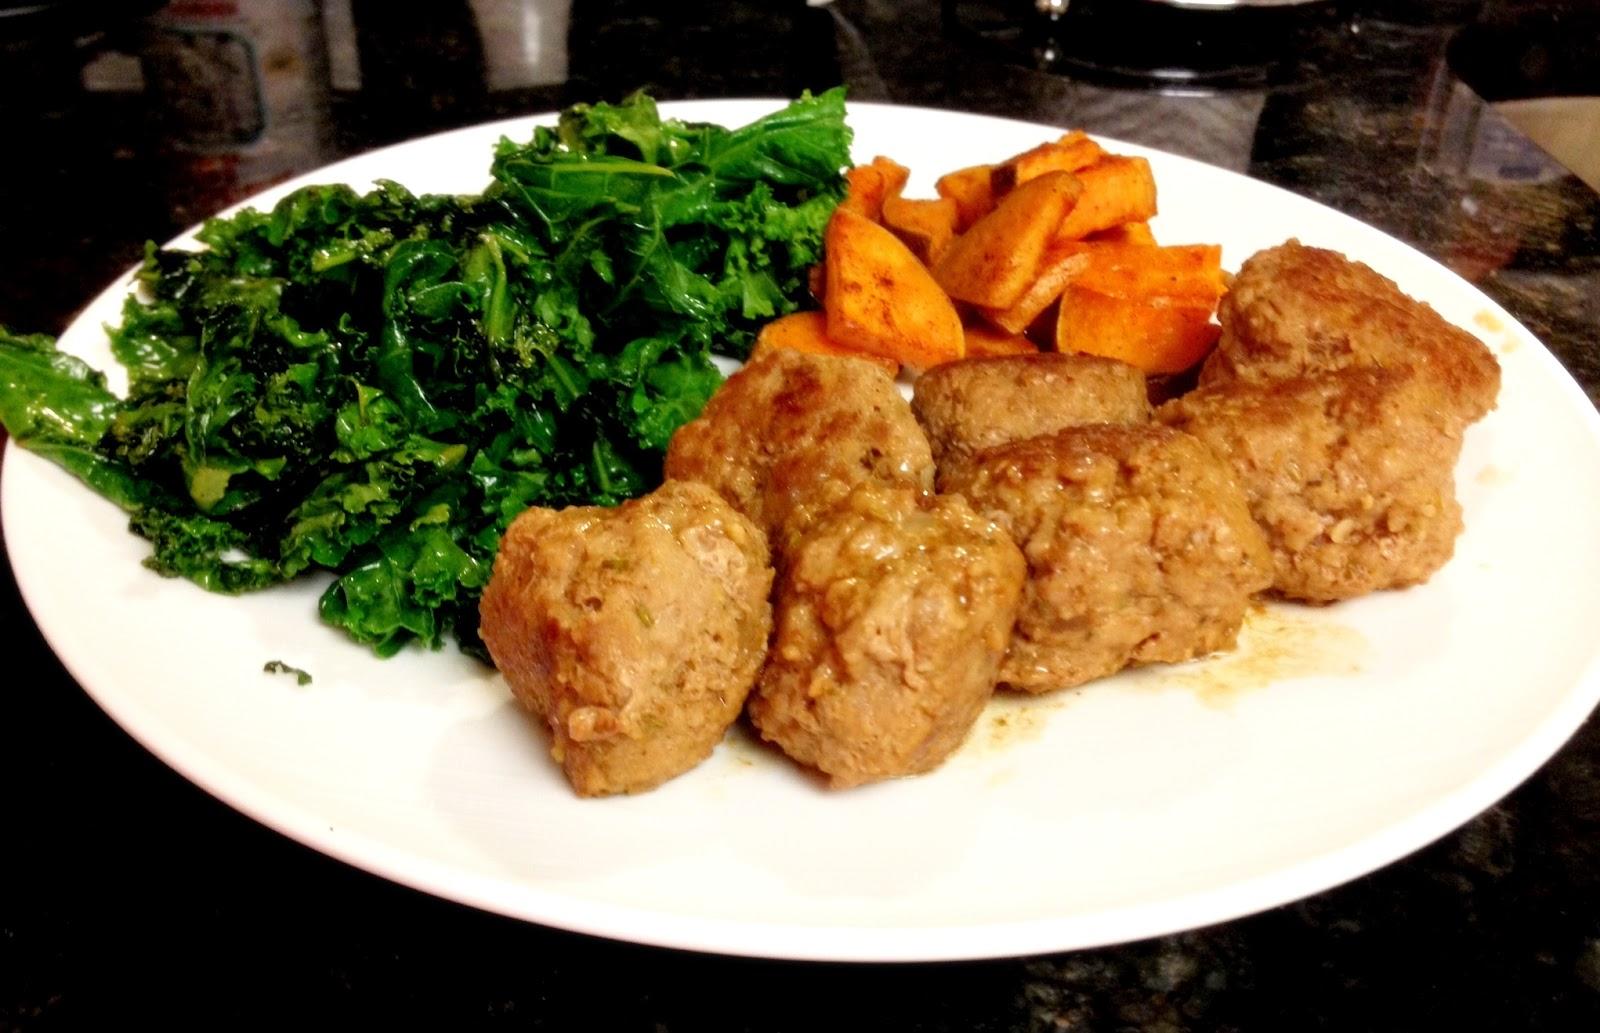 Resourceful Paleo: Herbed Turkey Meatballs (Easy Weeknight Meal)